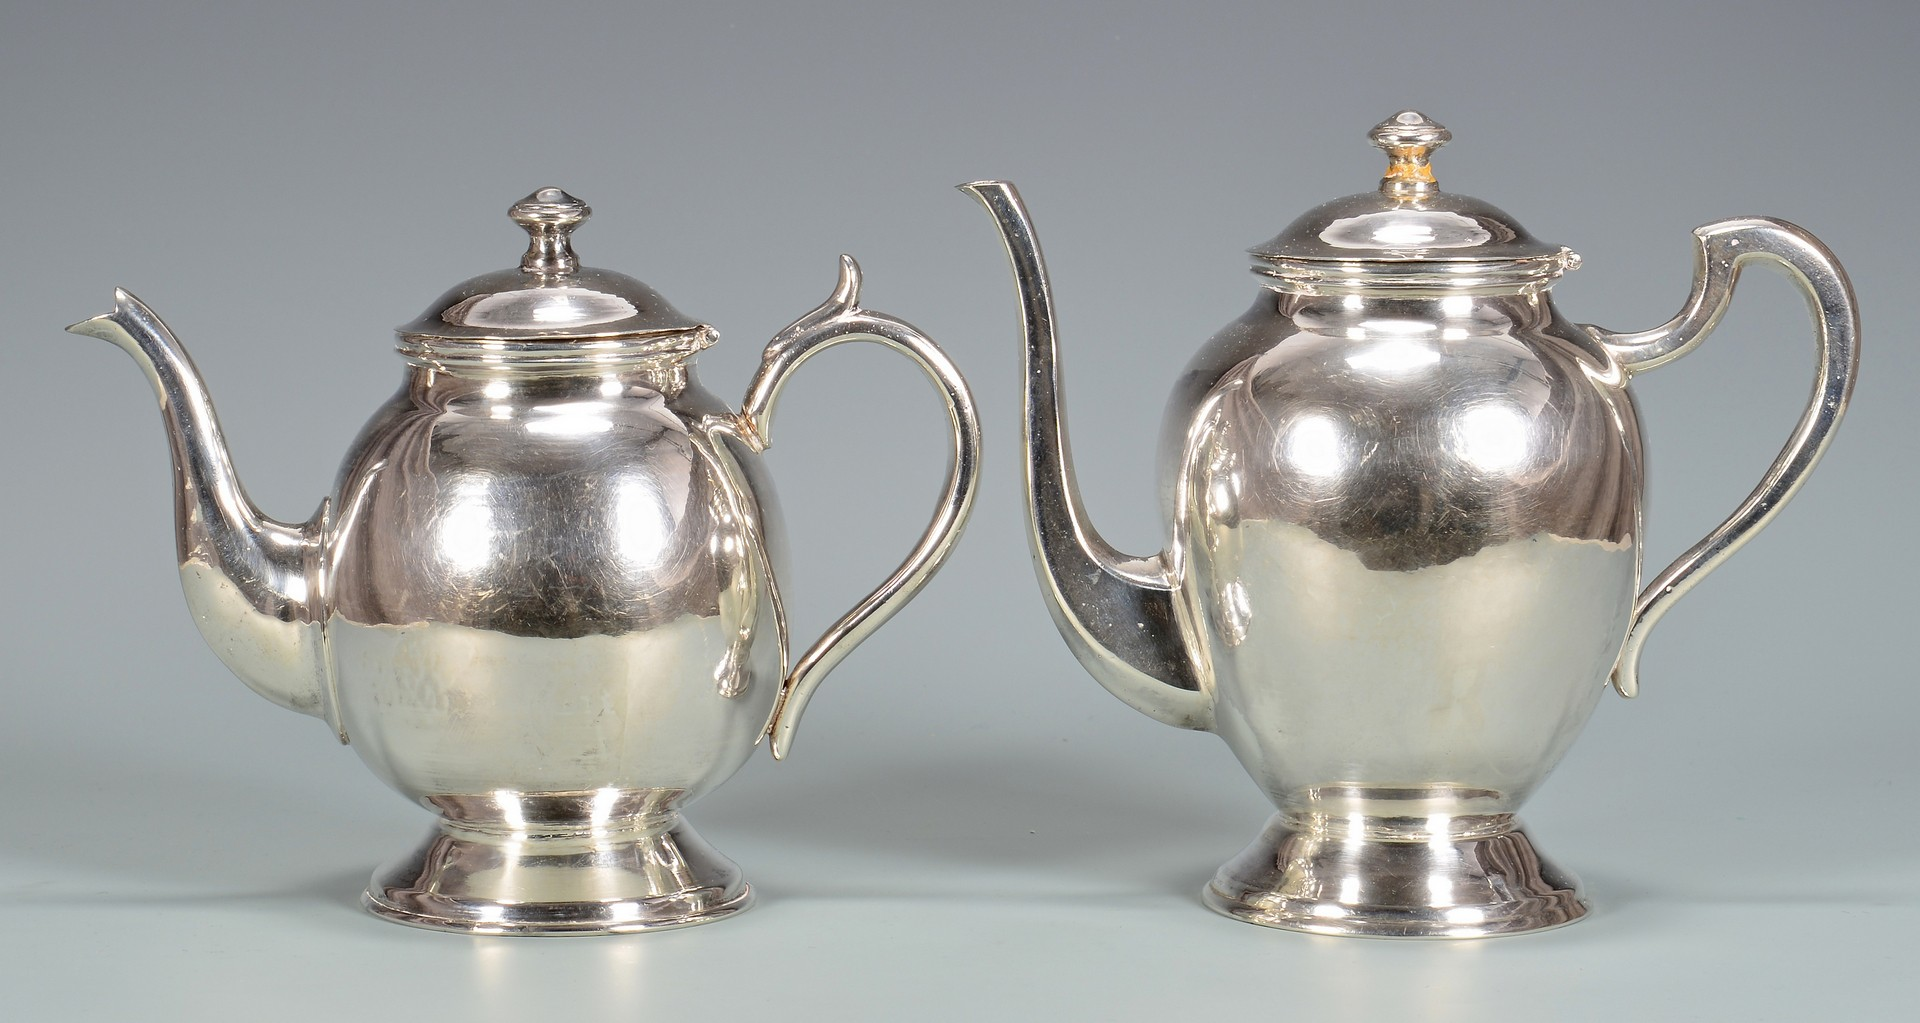 Lot 350: Heavy Peruvian Sterling Tray, Tea Set